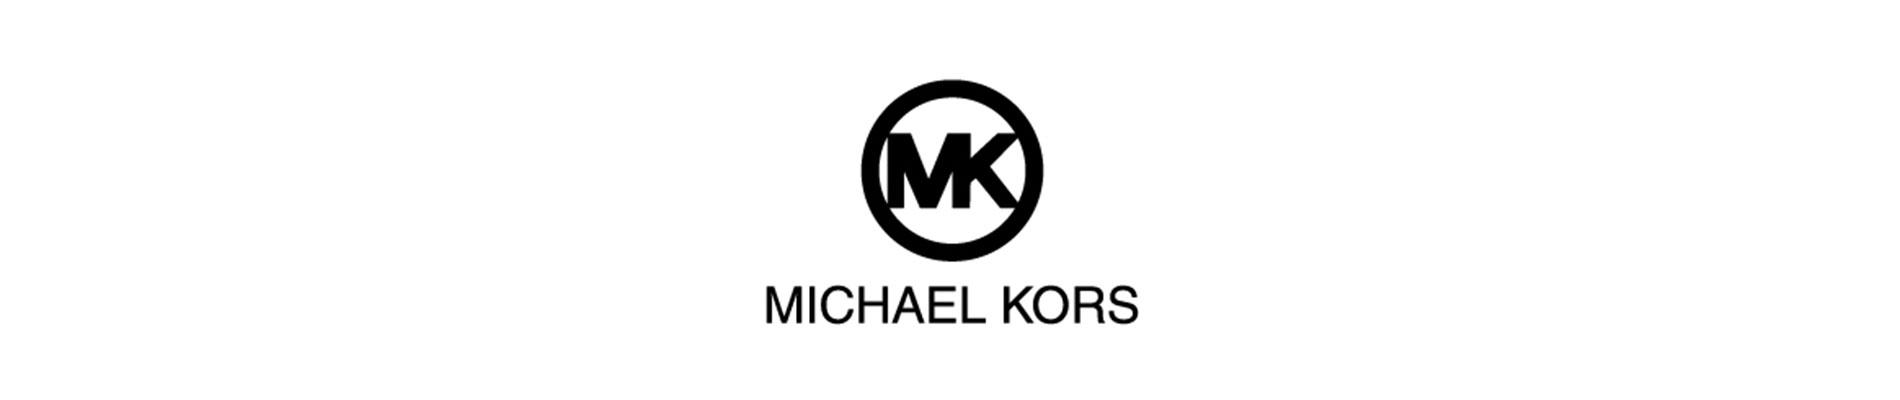 michale kors eyewear designer frame logo